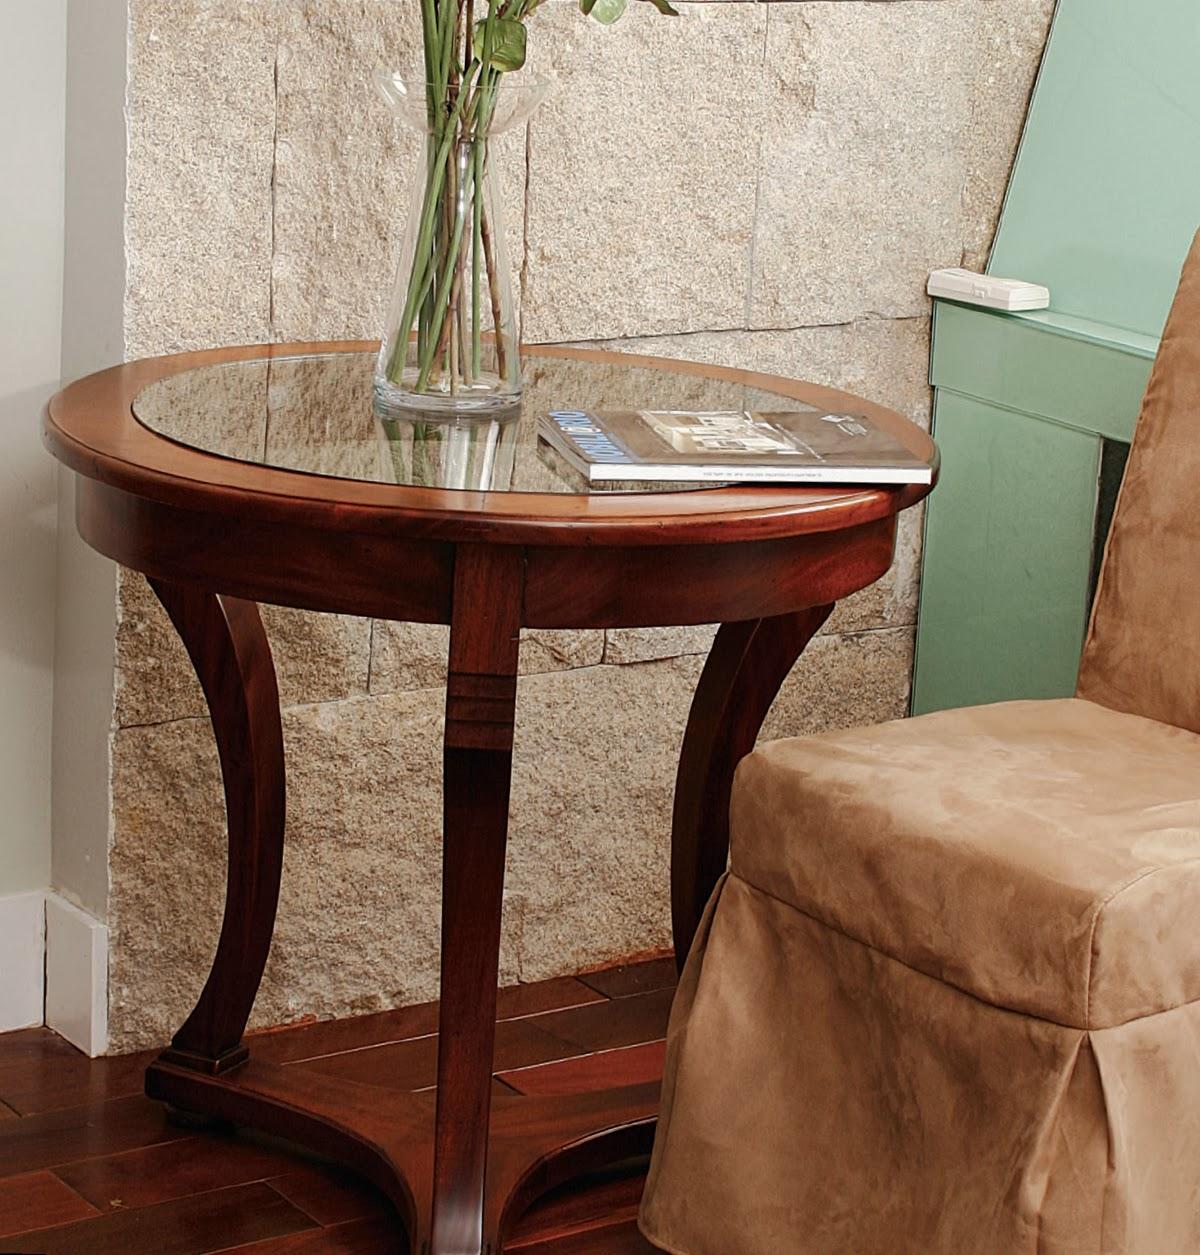 Muebles caoba clasicos 20170829004441 - Muebles de caoba ...